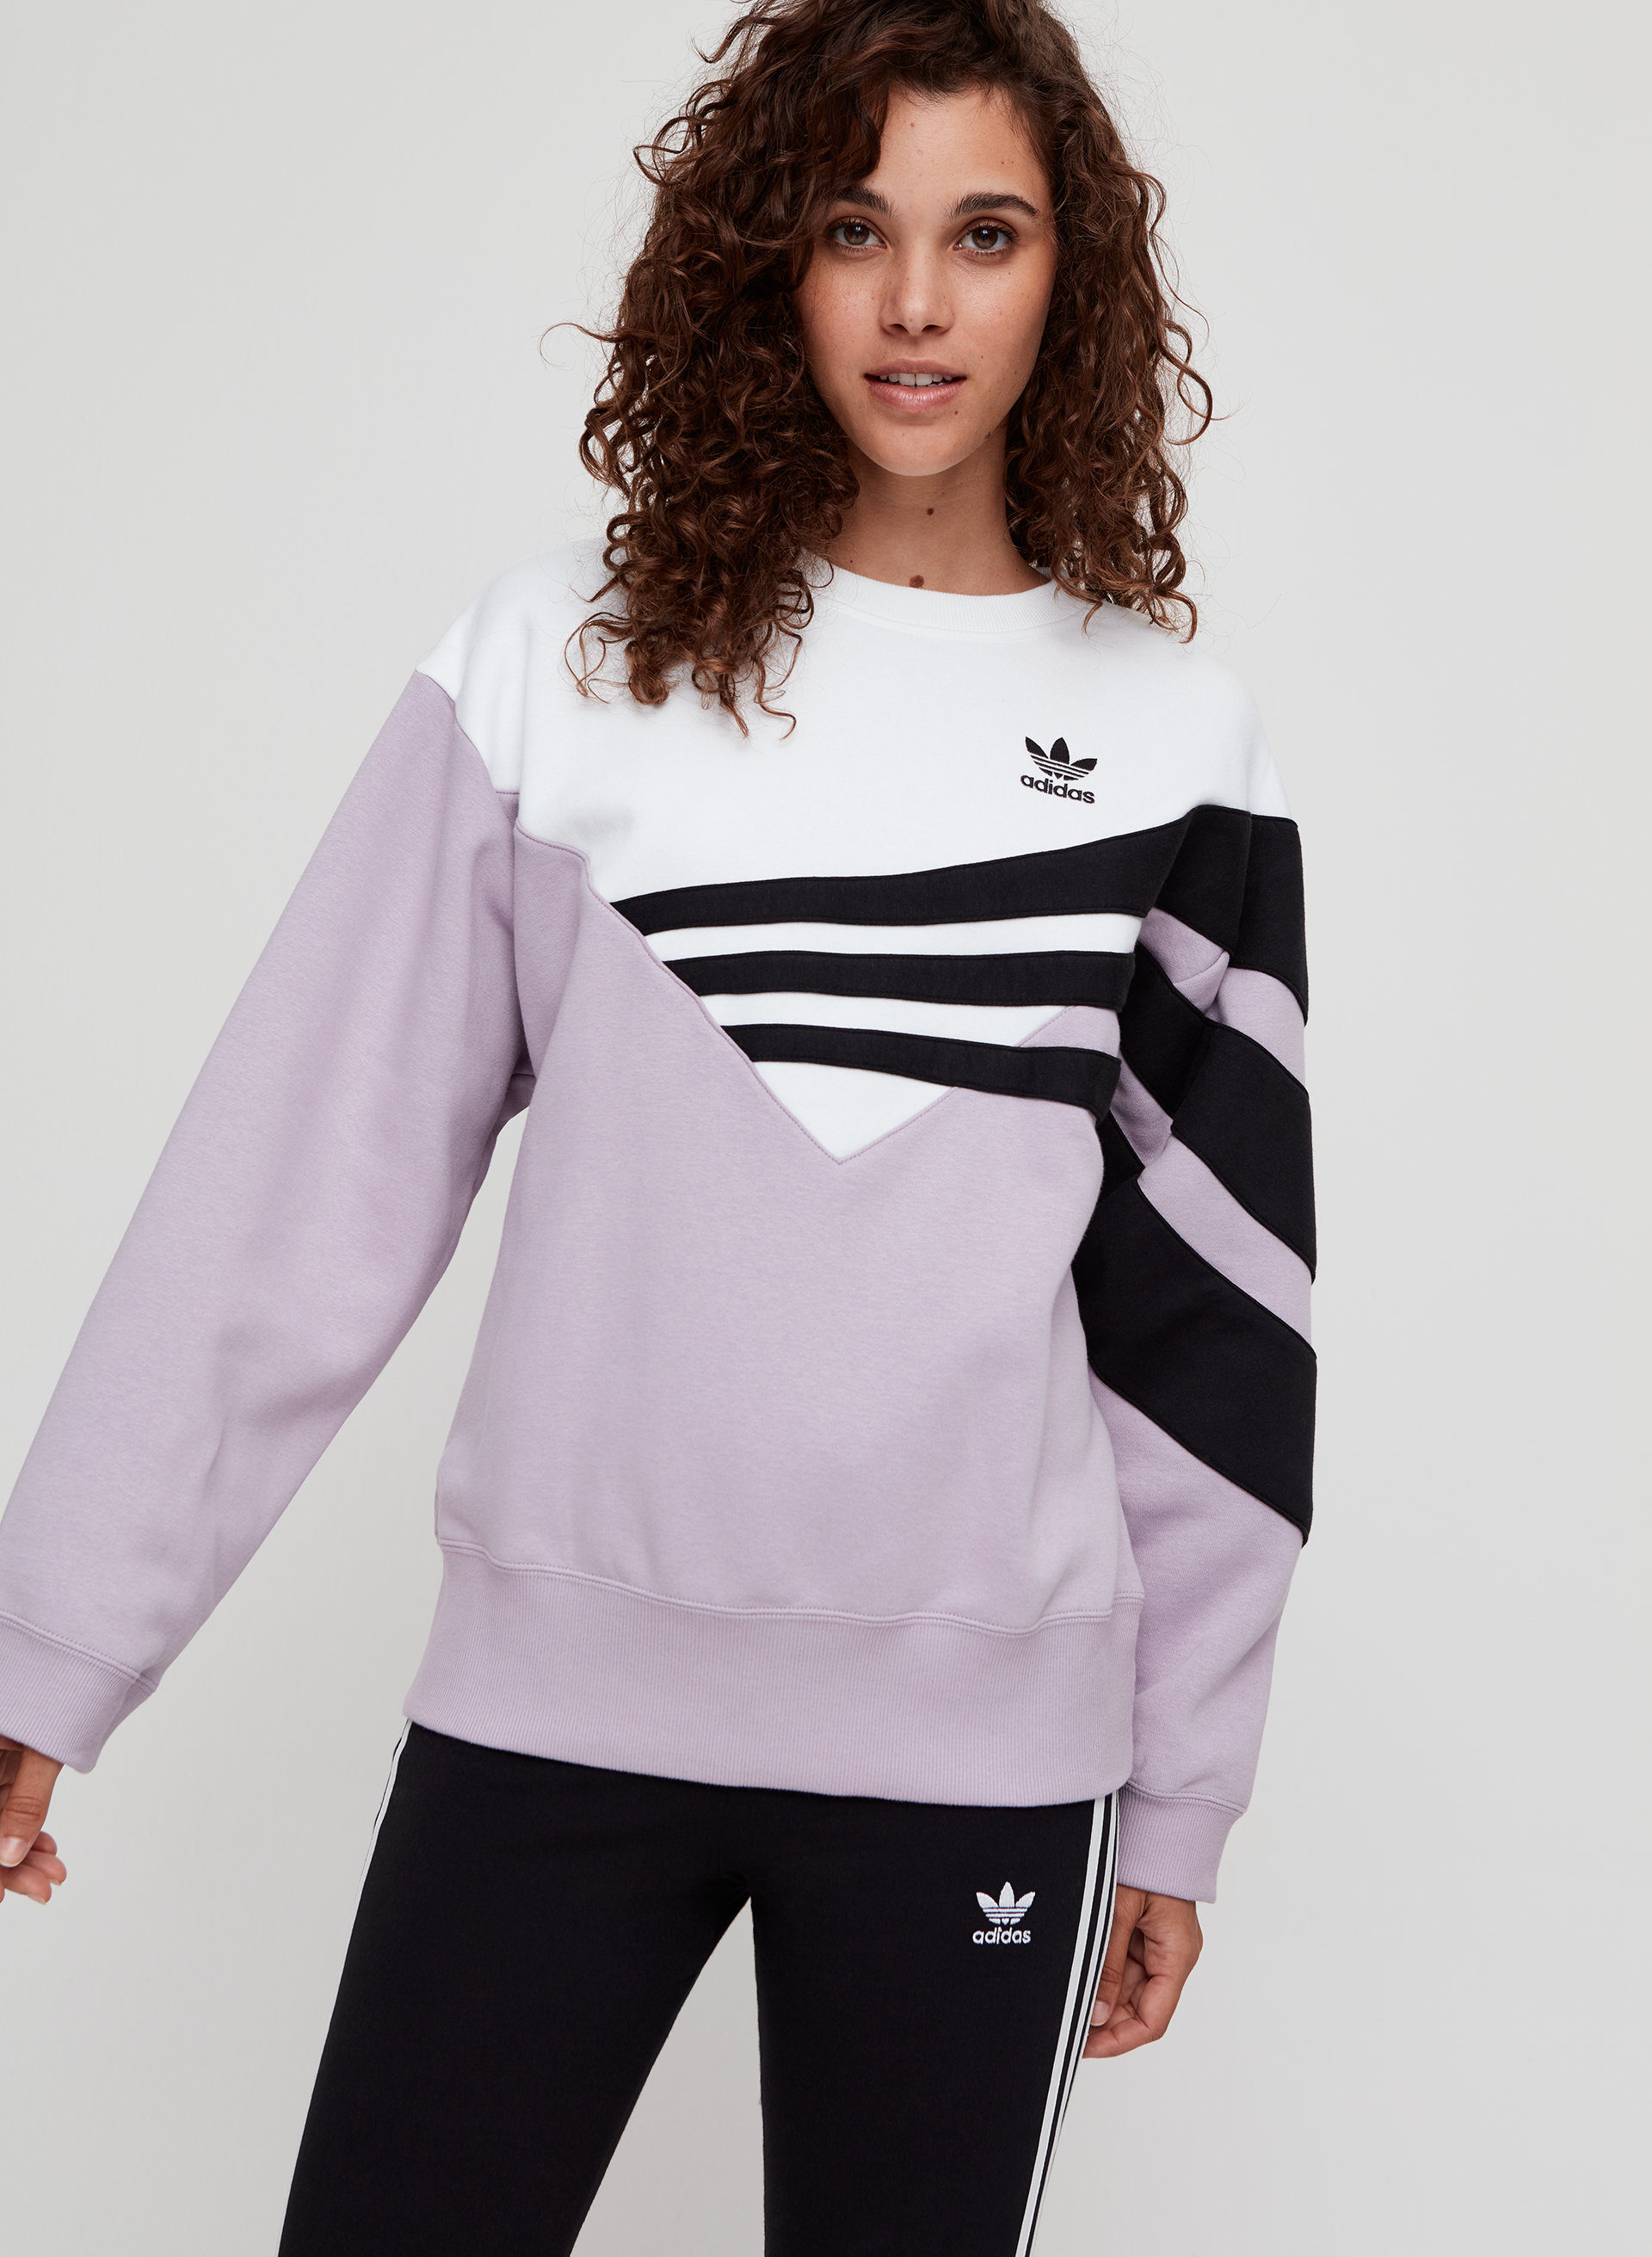 ed49d8ee adidas sweater Retro-inspired crewneck sweatshirt